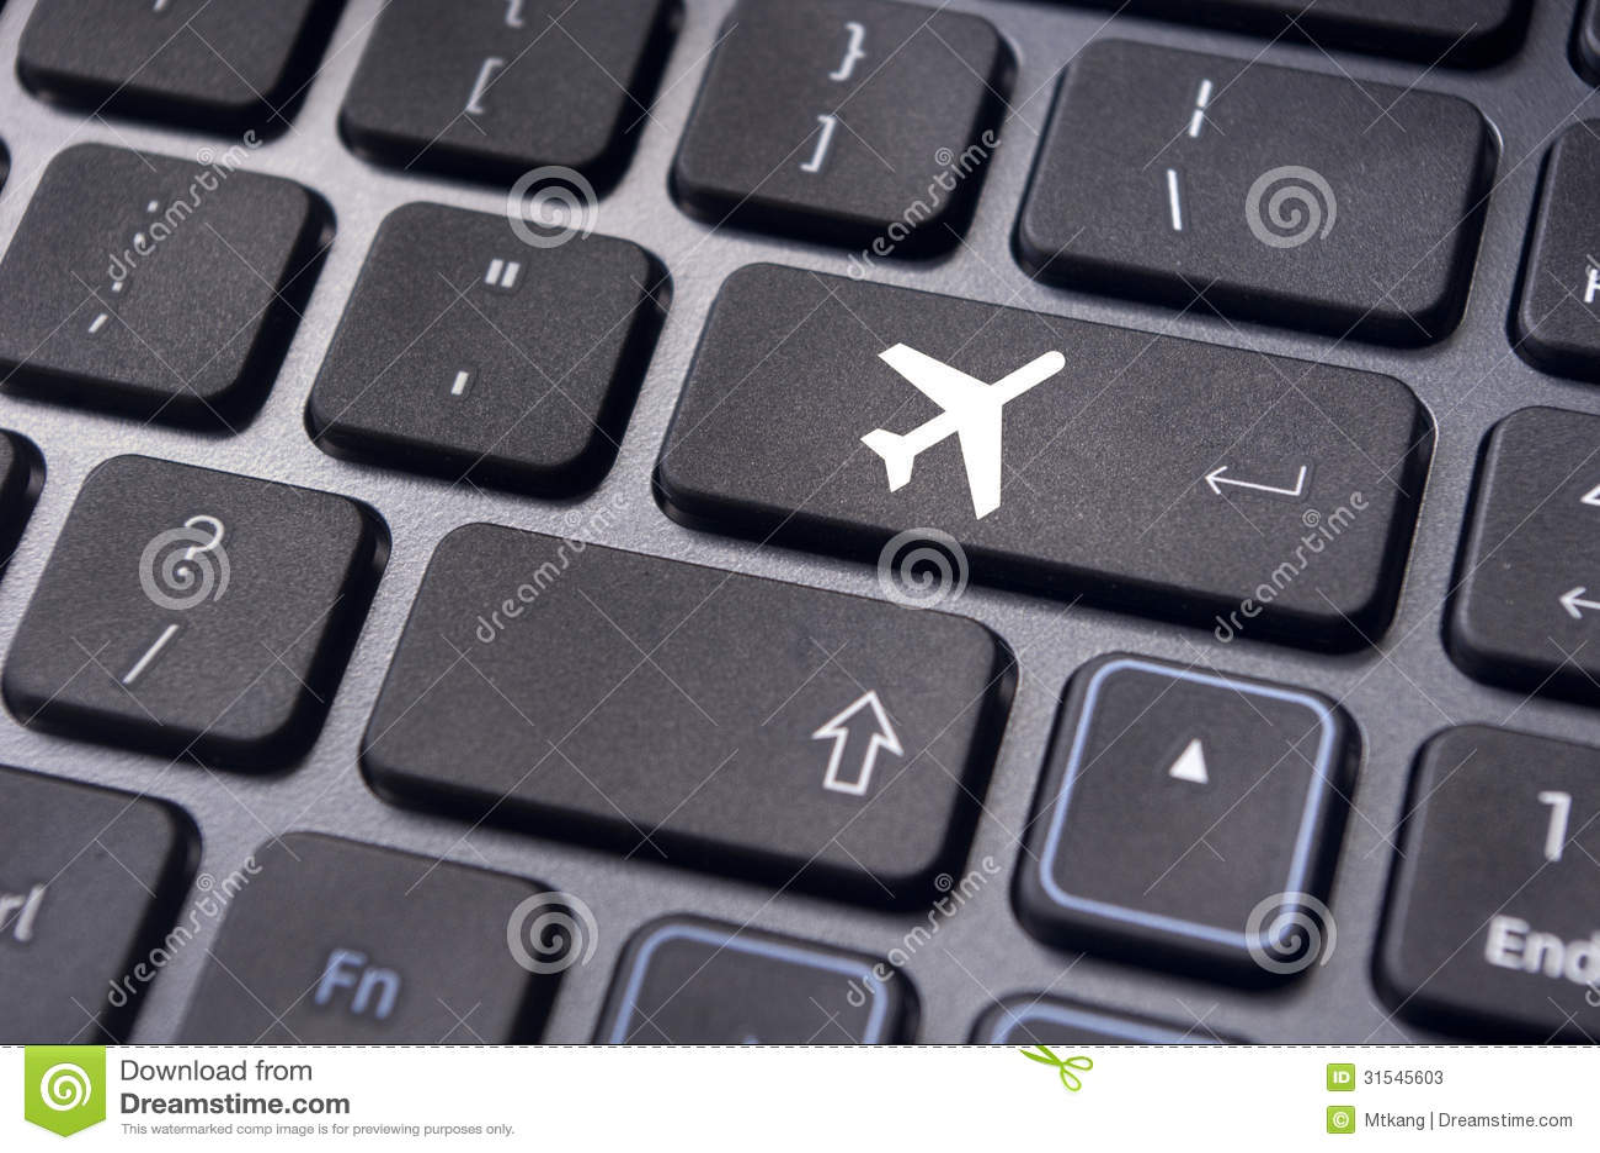 Как купить авиабилет онлайн? - Sky Express